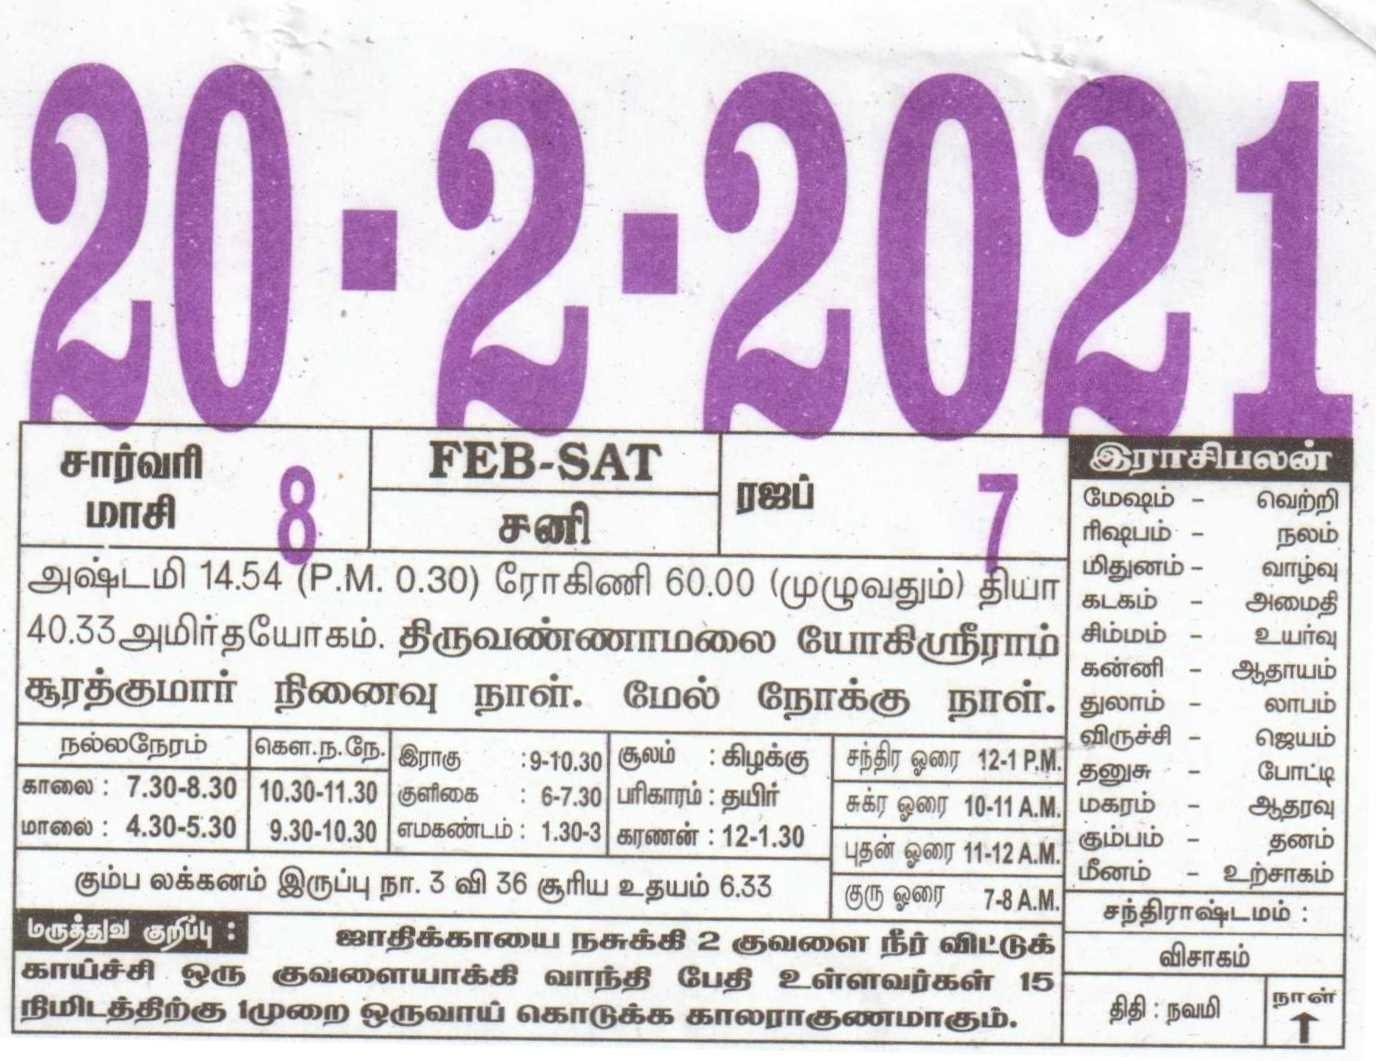 20-02-2021 Daily Calendar | Date 20 , January Daily Tear Off Calendar | Daily Panchangam Rasi Palan June 2021 Tamil Daily Calendar